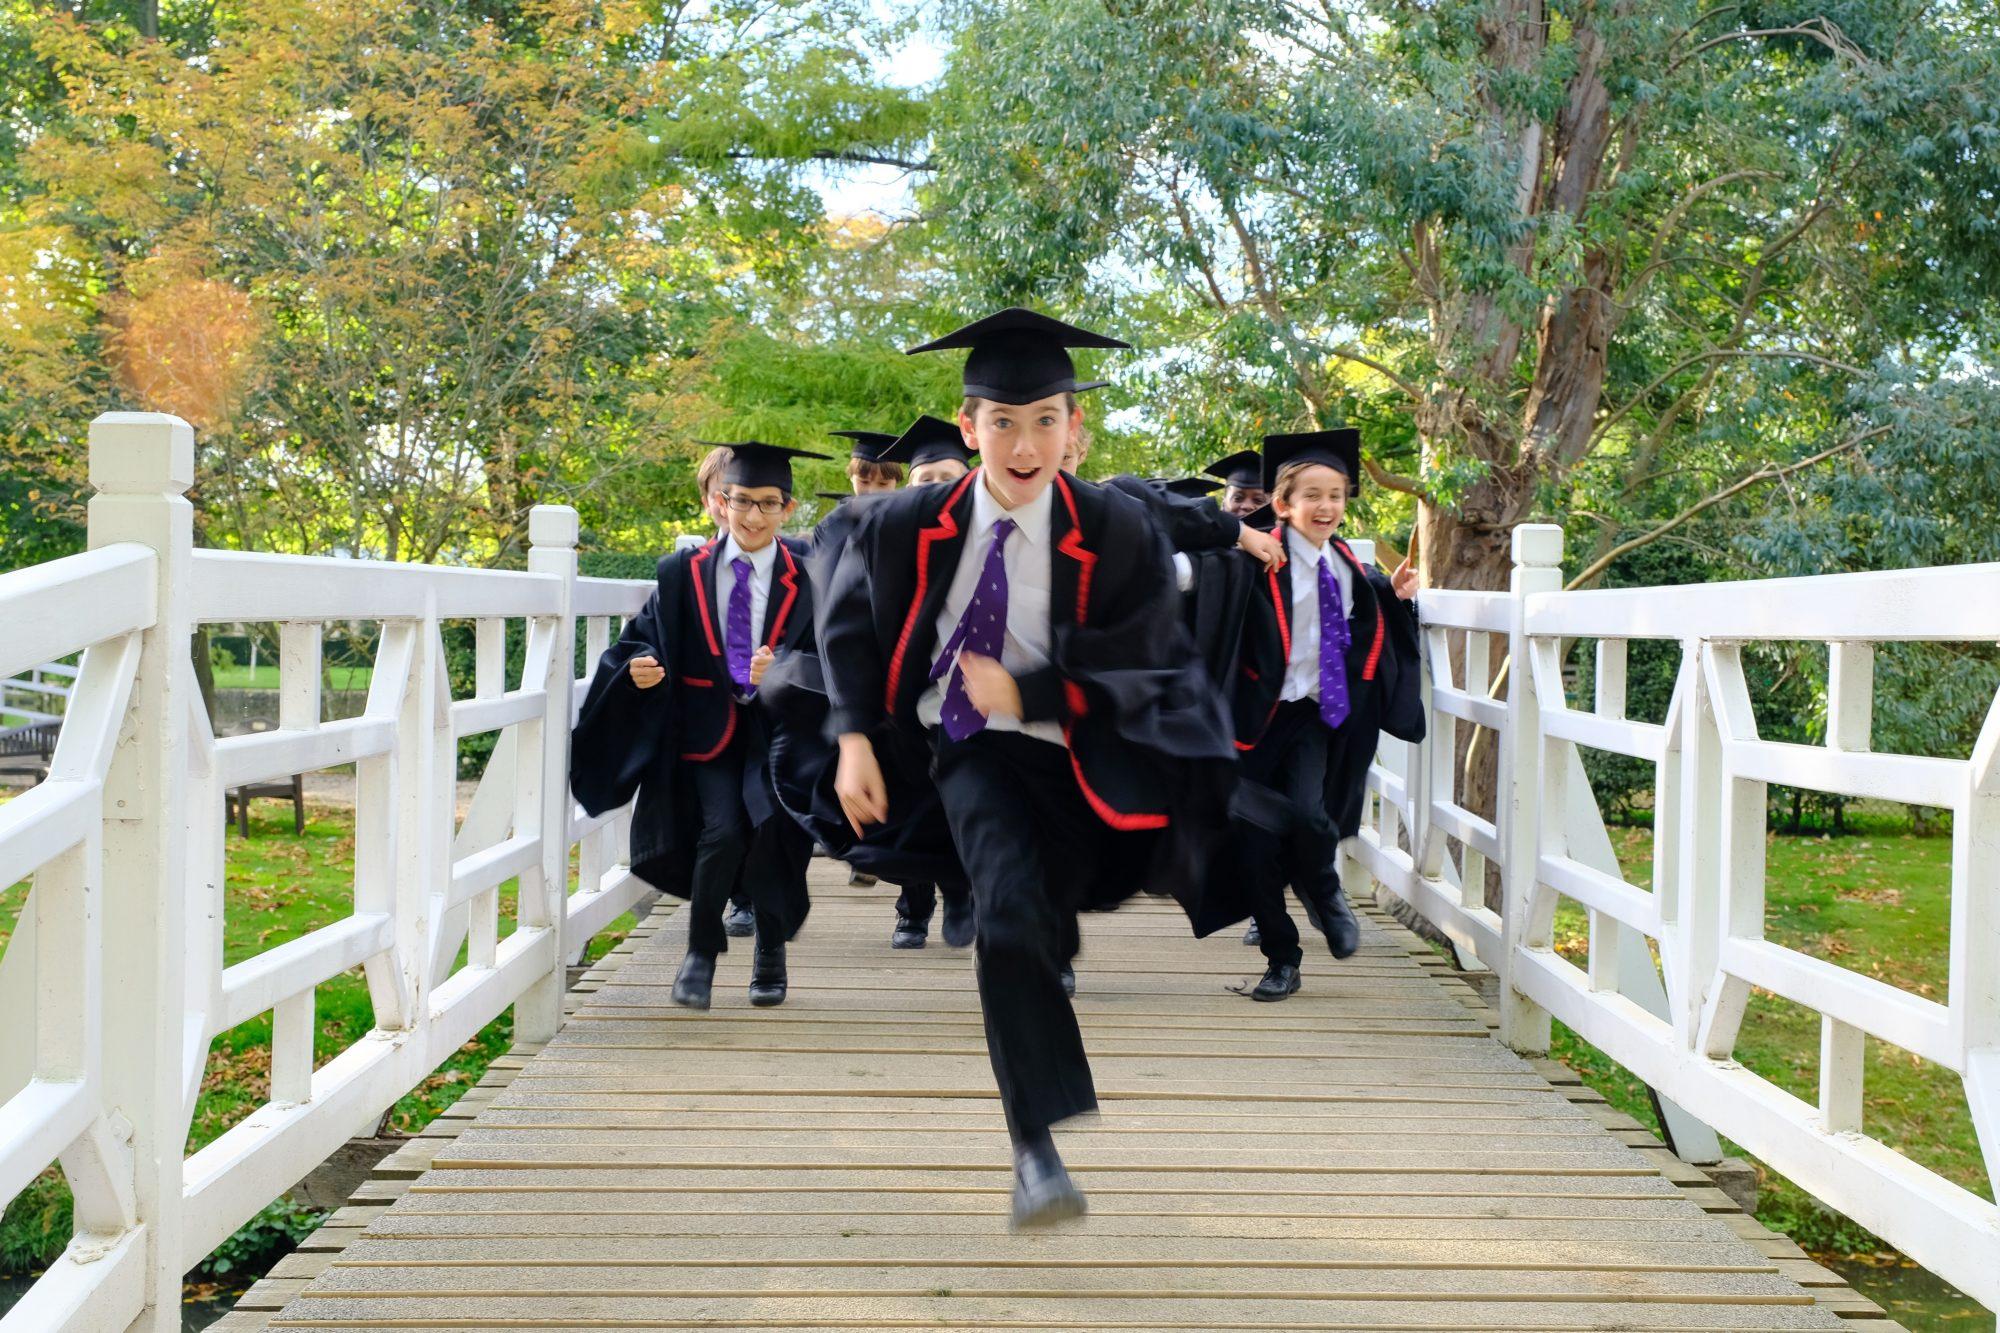 Magdalen College School pupils running over white bridges in Chorister uniform